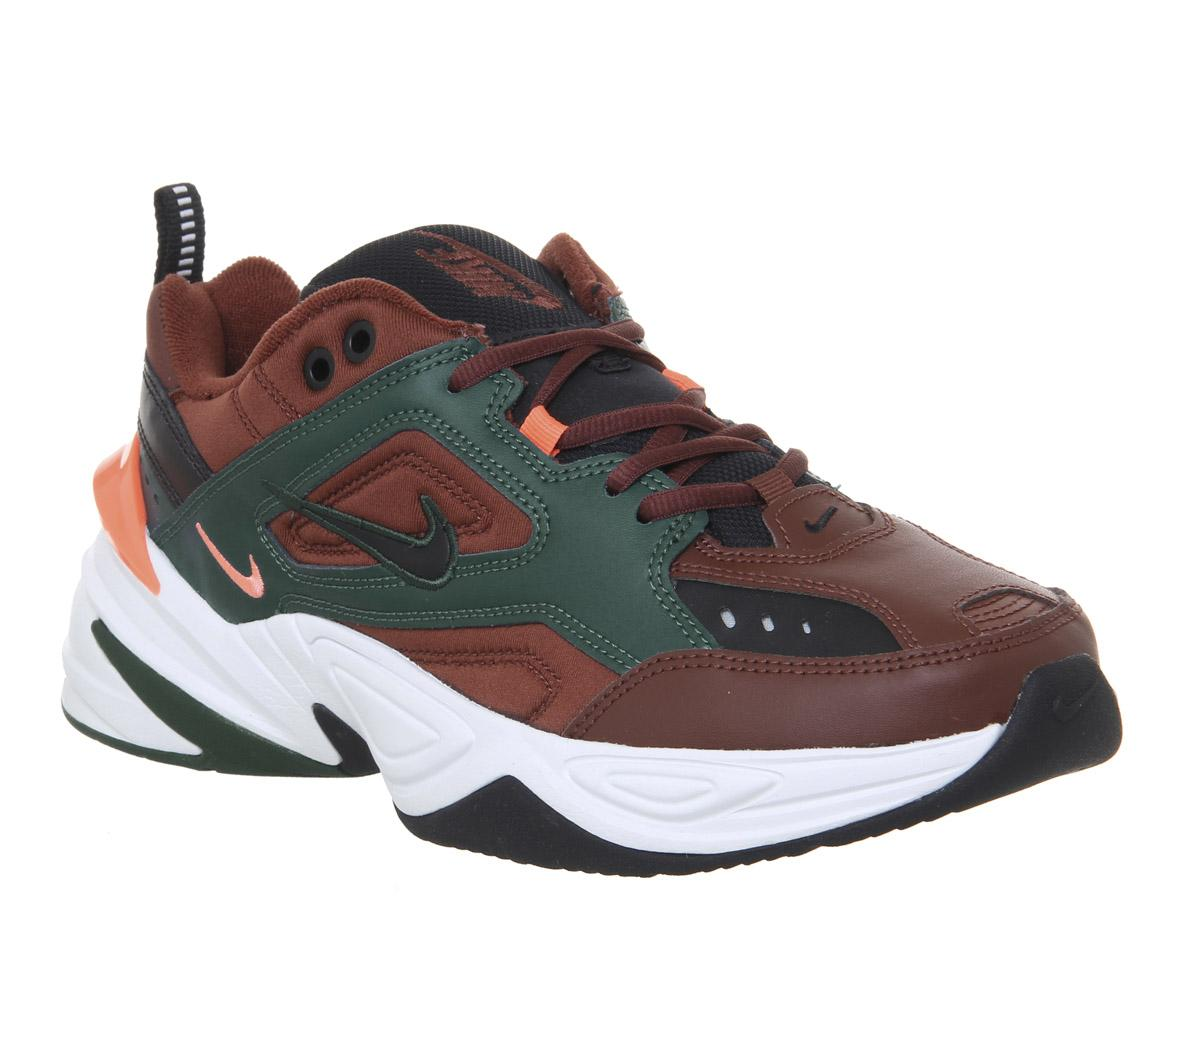 Nike M2k Tekno Trainers Pueblo Brown